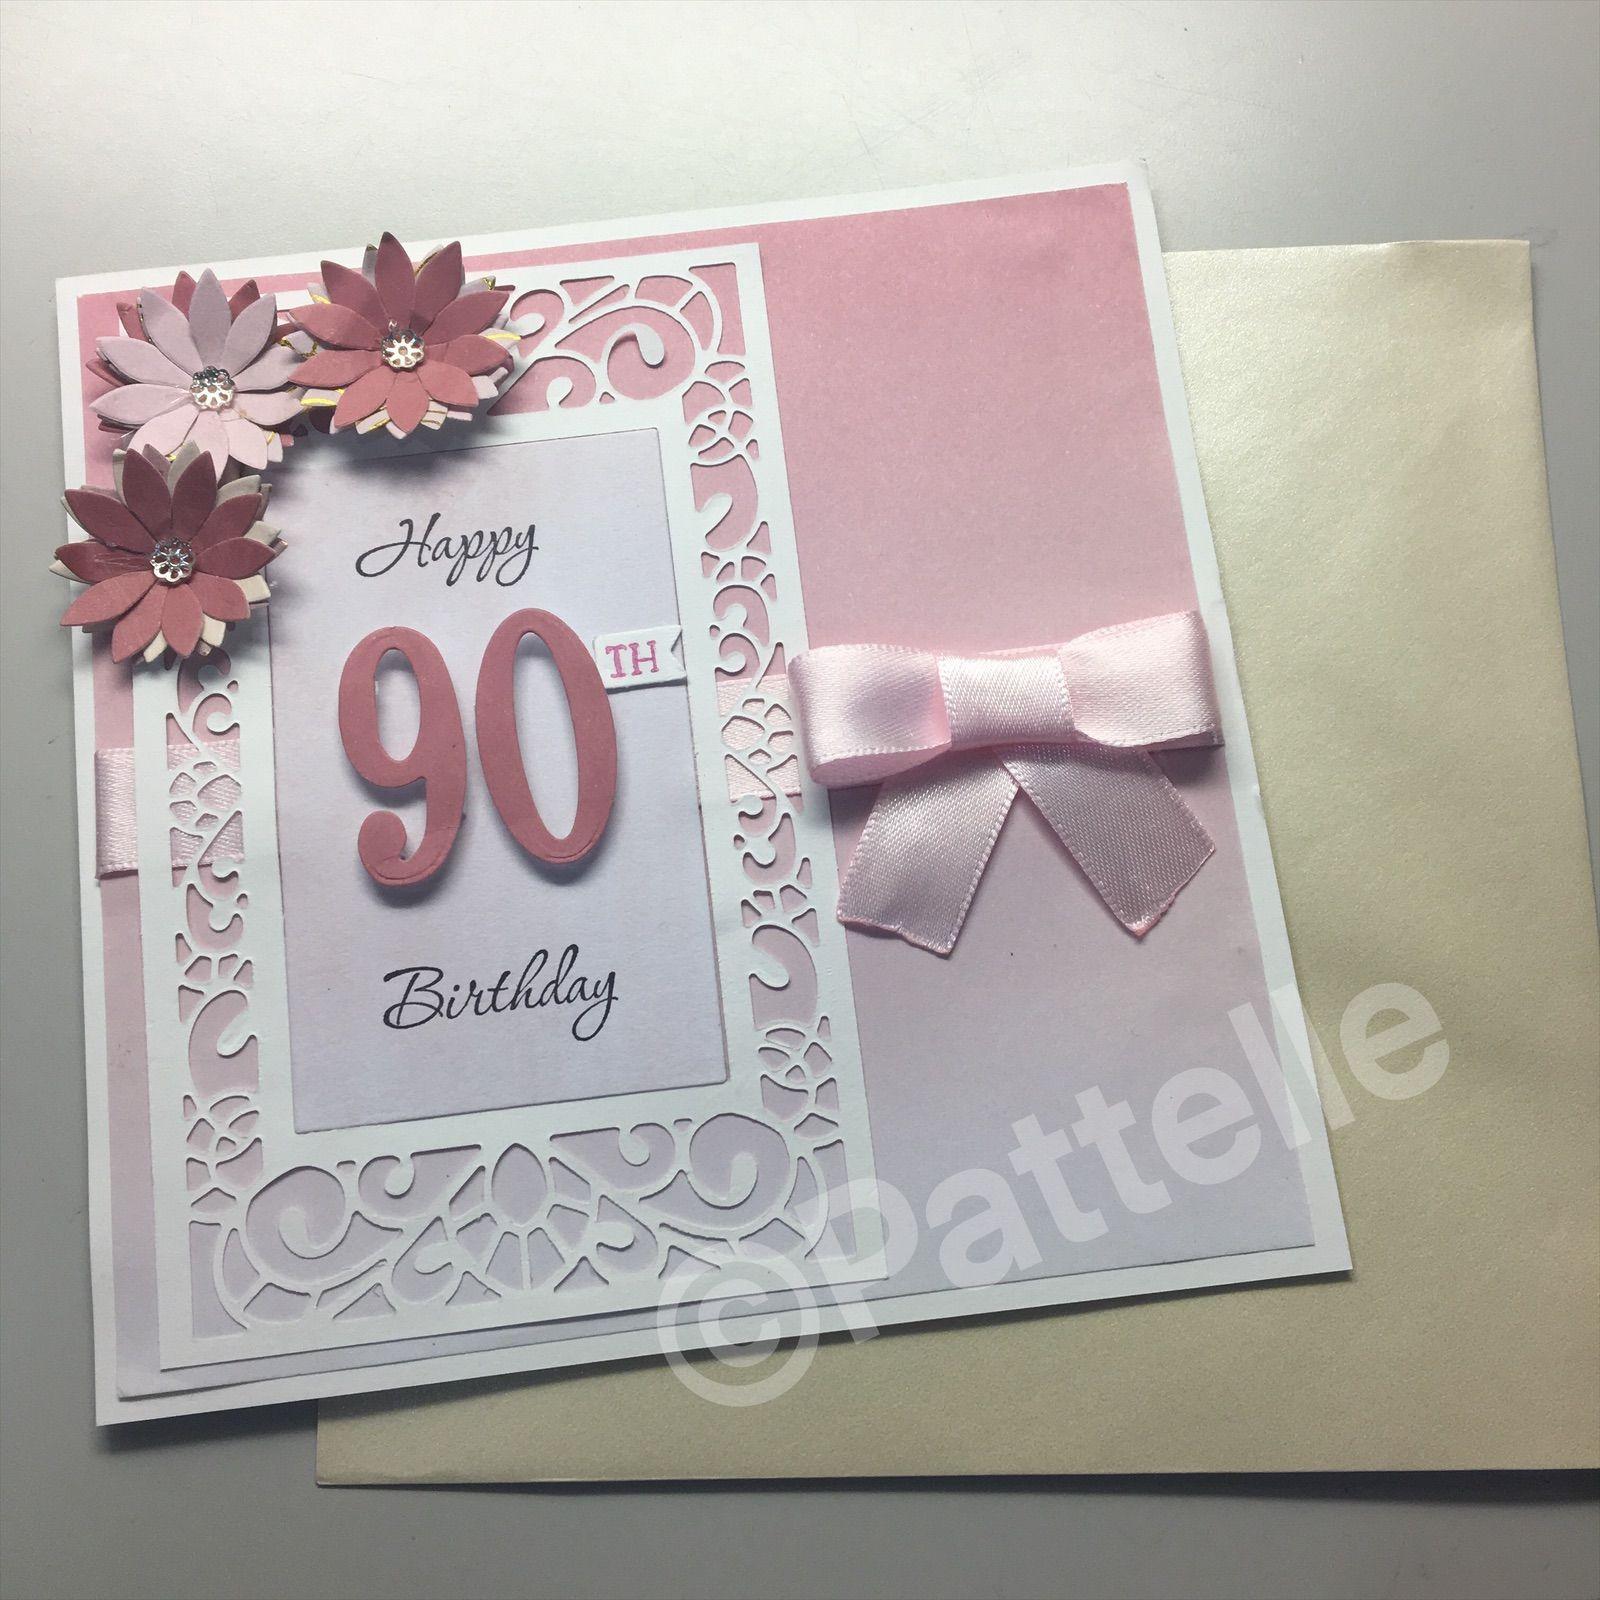 90th Birthday Card Handmade Cards Cardmaking Kaisercraft Milestone Birthday Female B Birthday Cards Handmade Female 70th Birthday Card 90th Birthday Cards